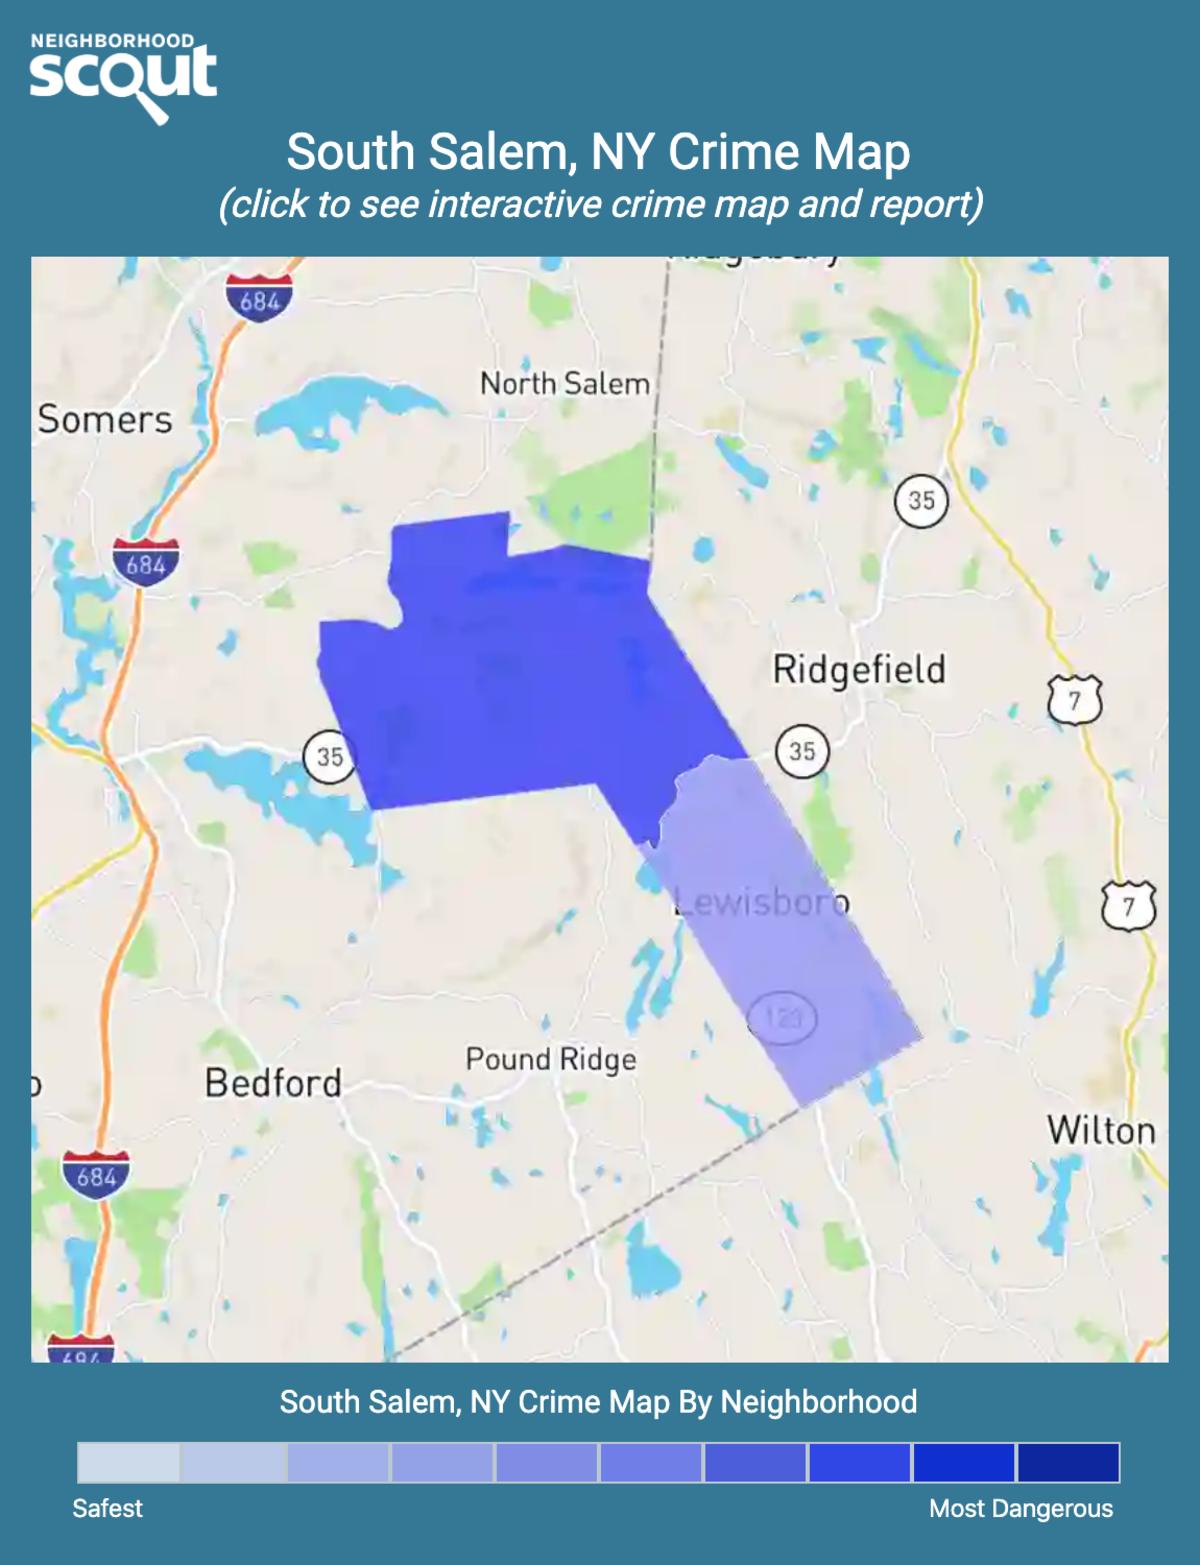 South Salem, New York crime map